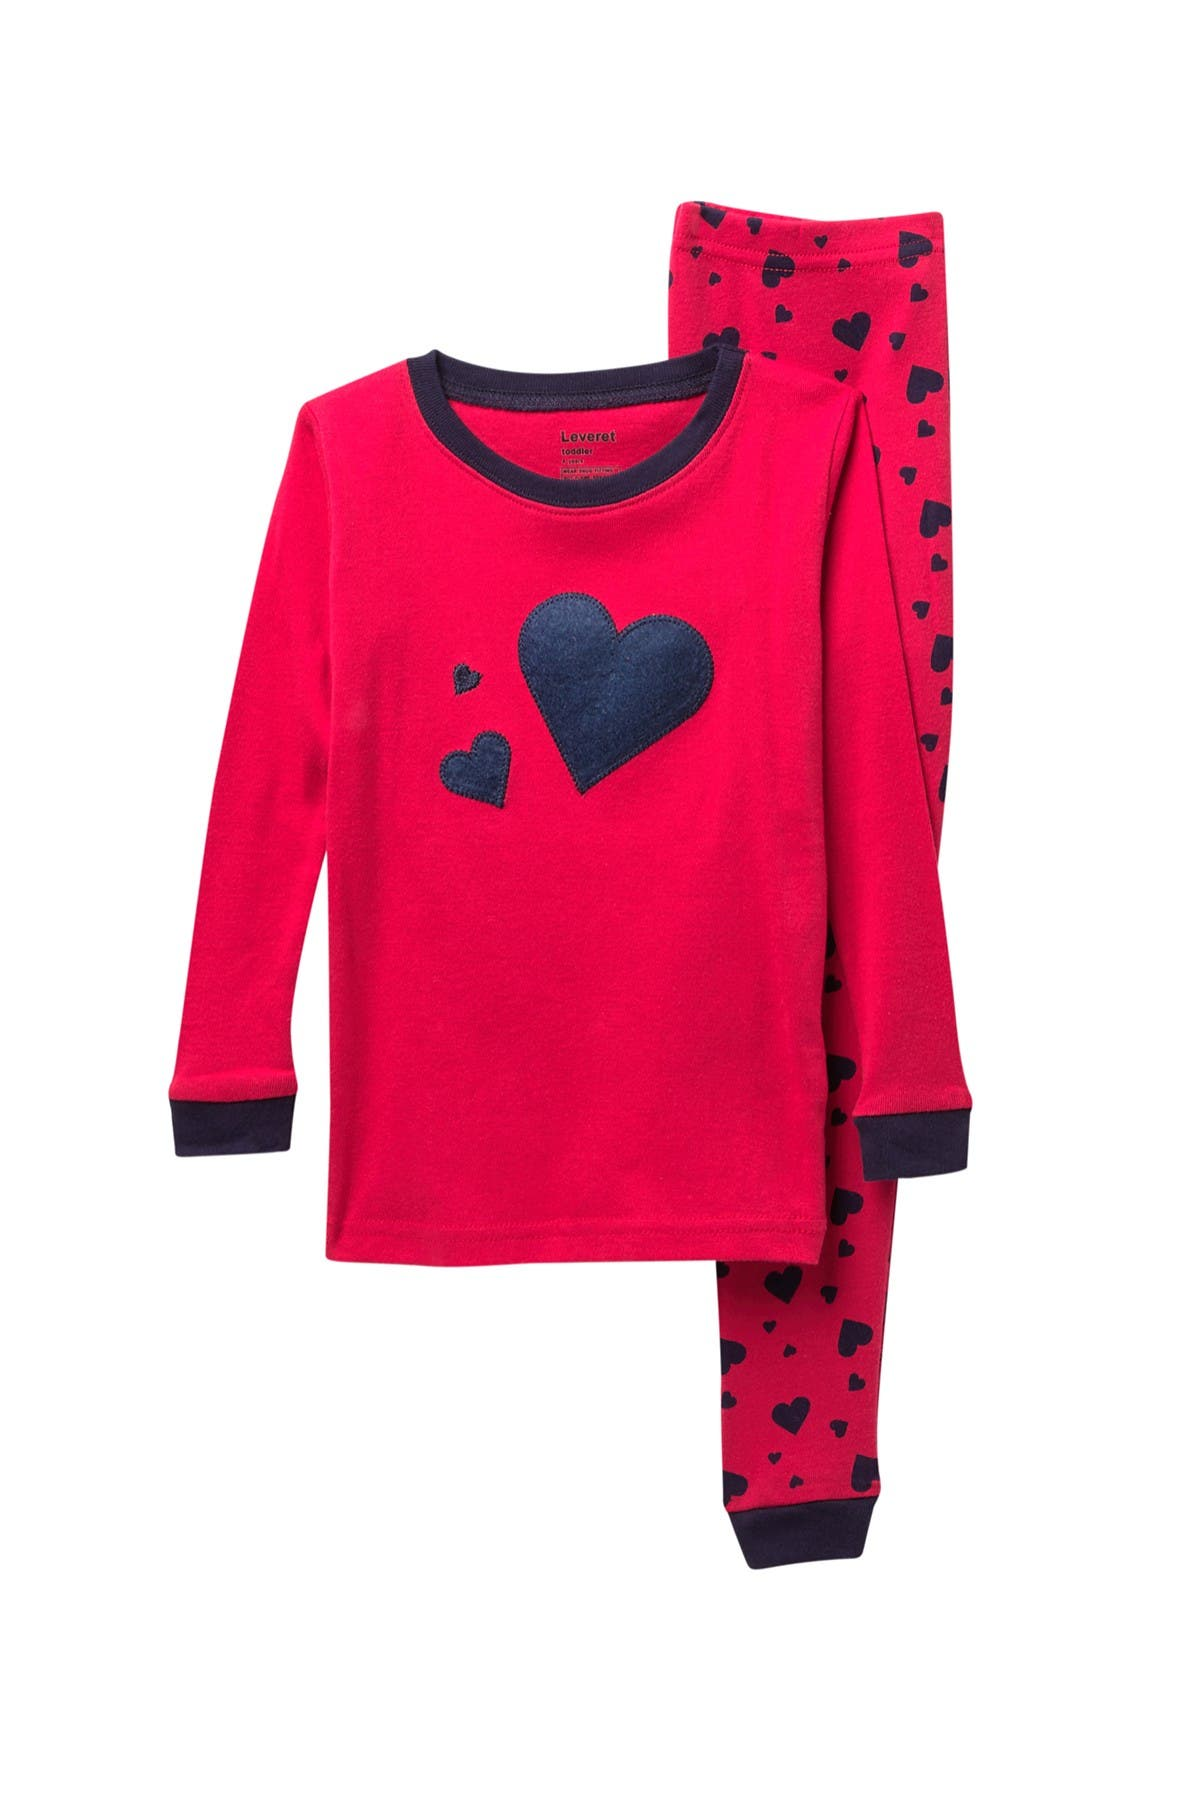 Image of Leveret Navy Hearts 2-Piece Pajama Set